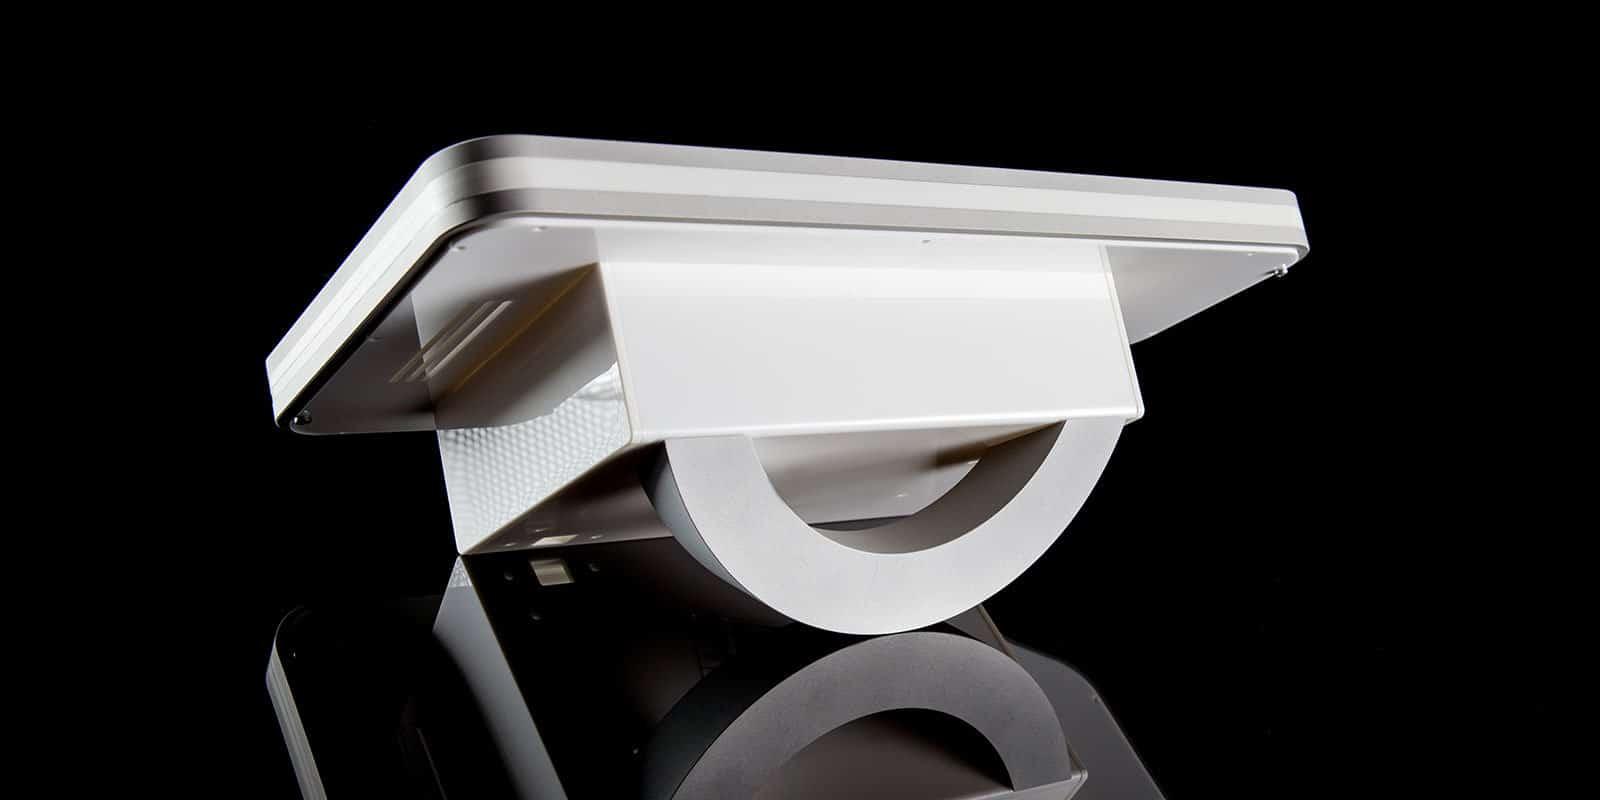 Pultgehäuse mit Aluminium Standfuß